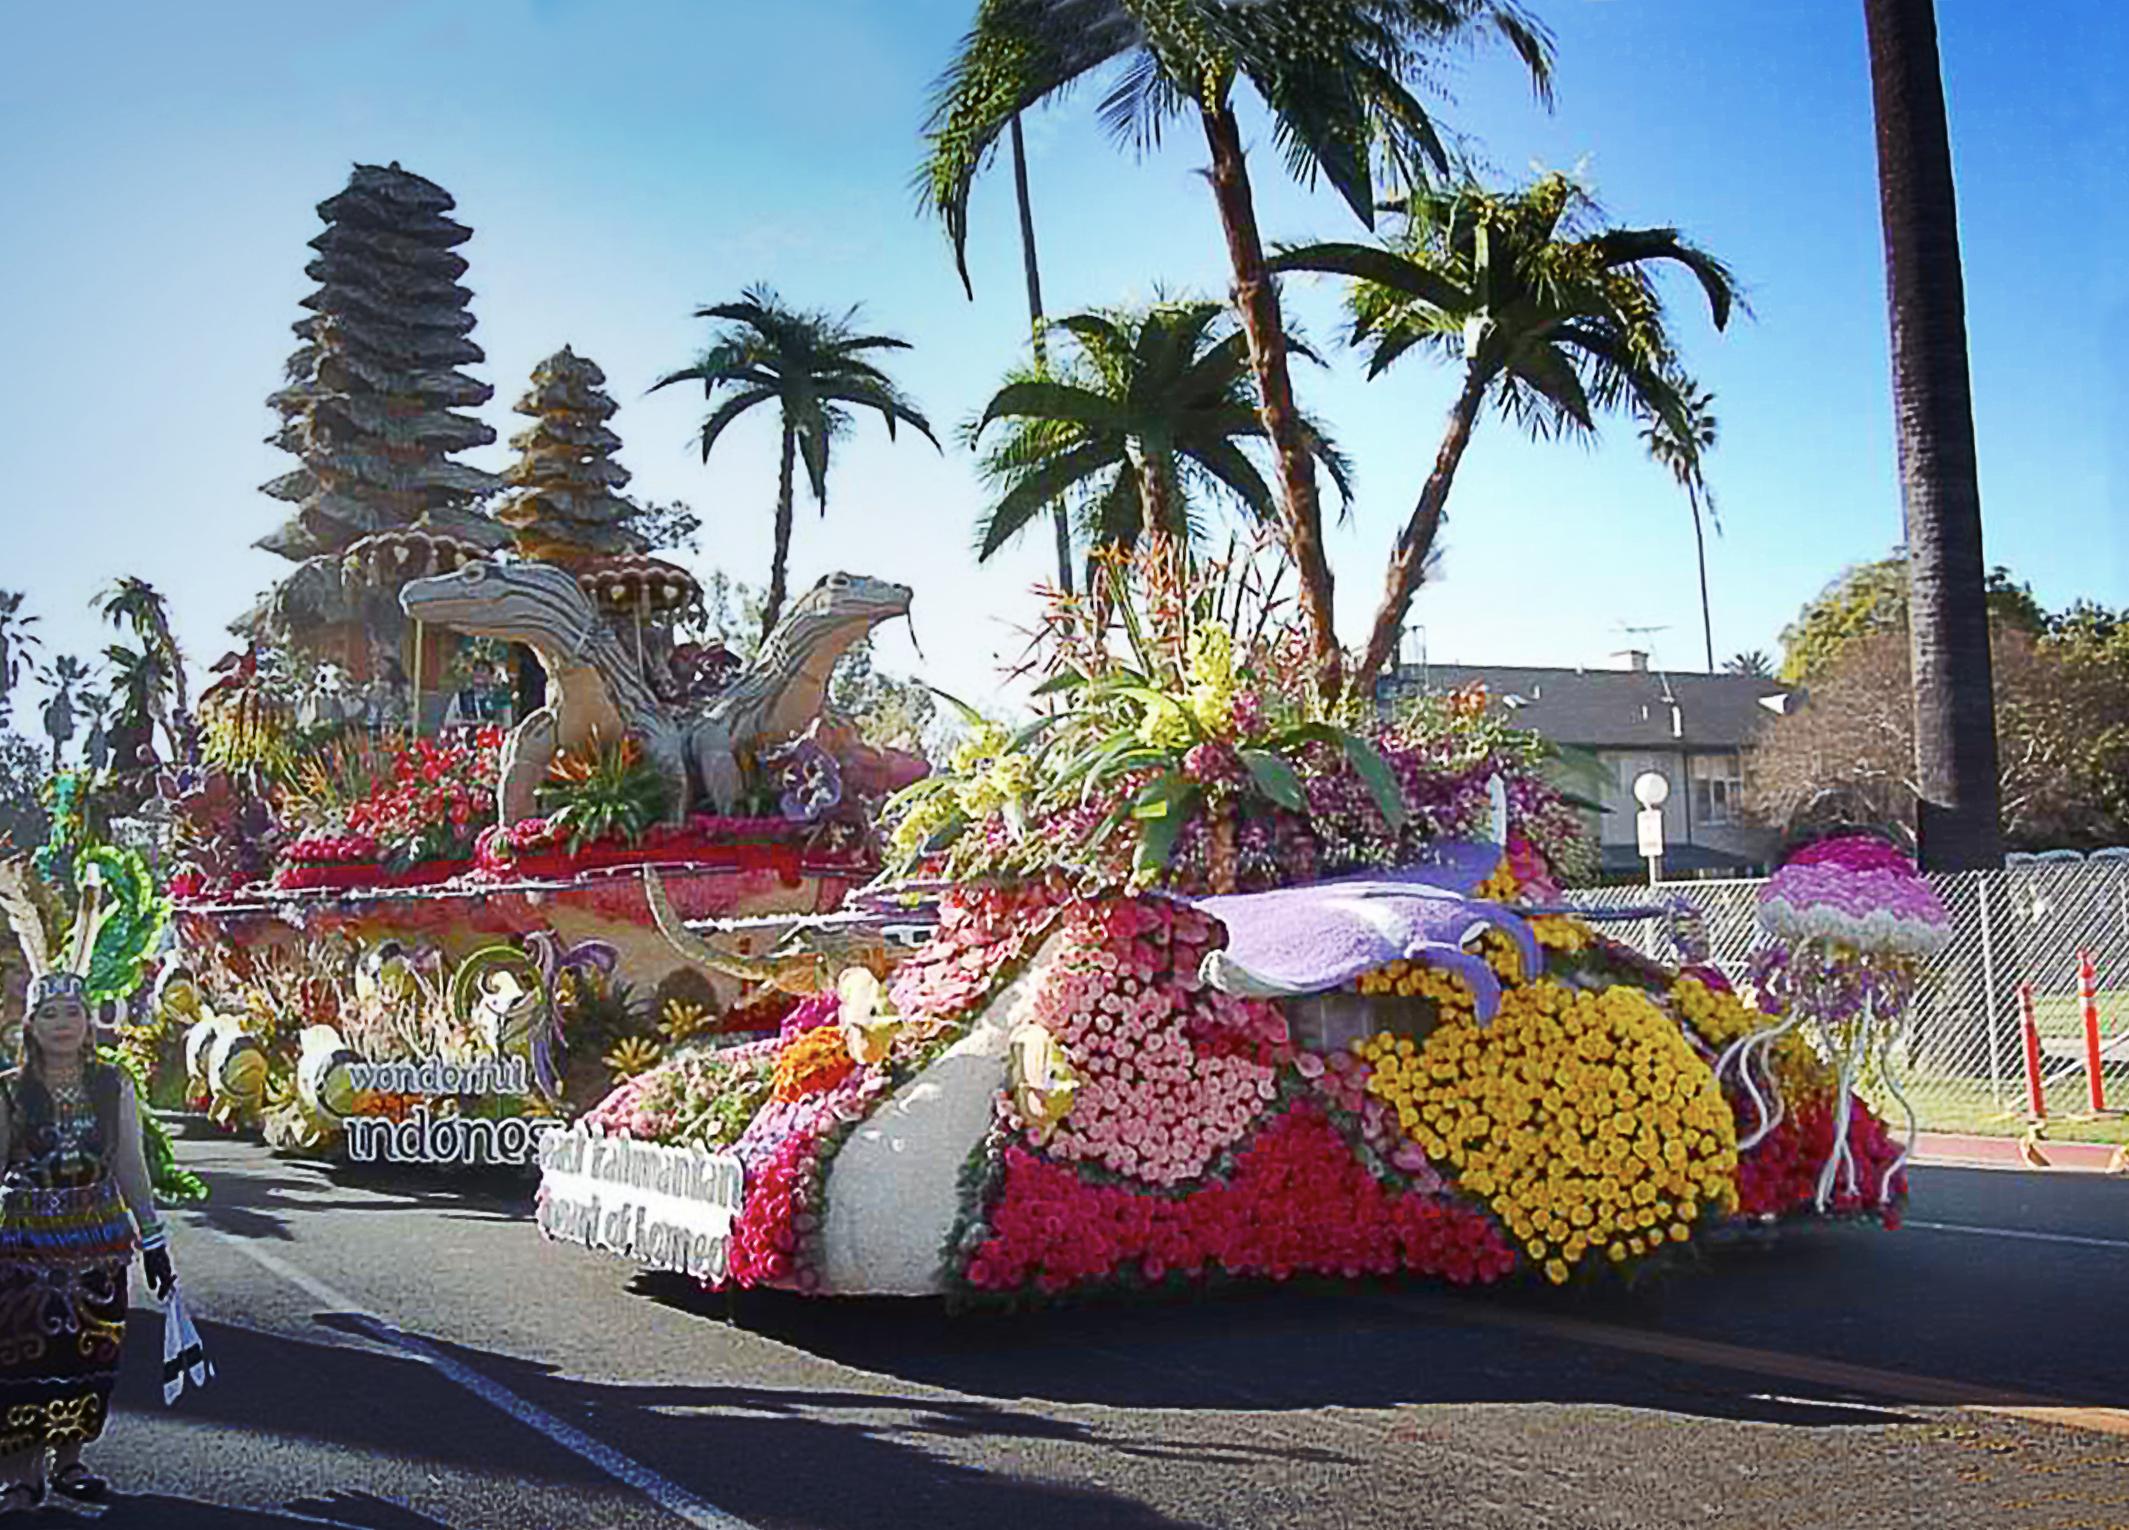 roseparade winning entries-indonesia 4.jpg